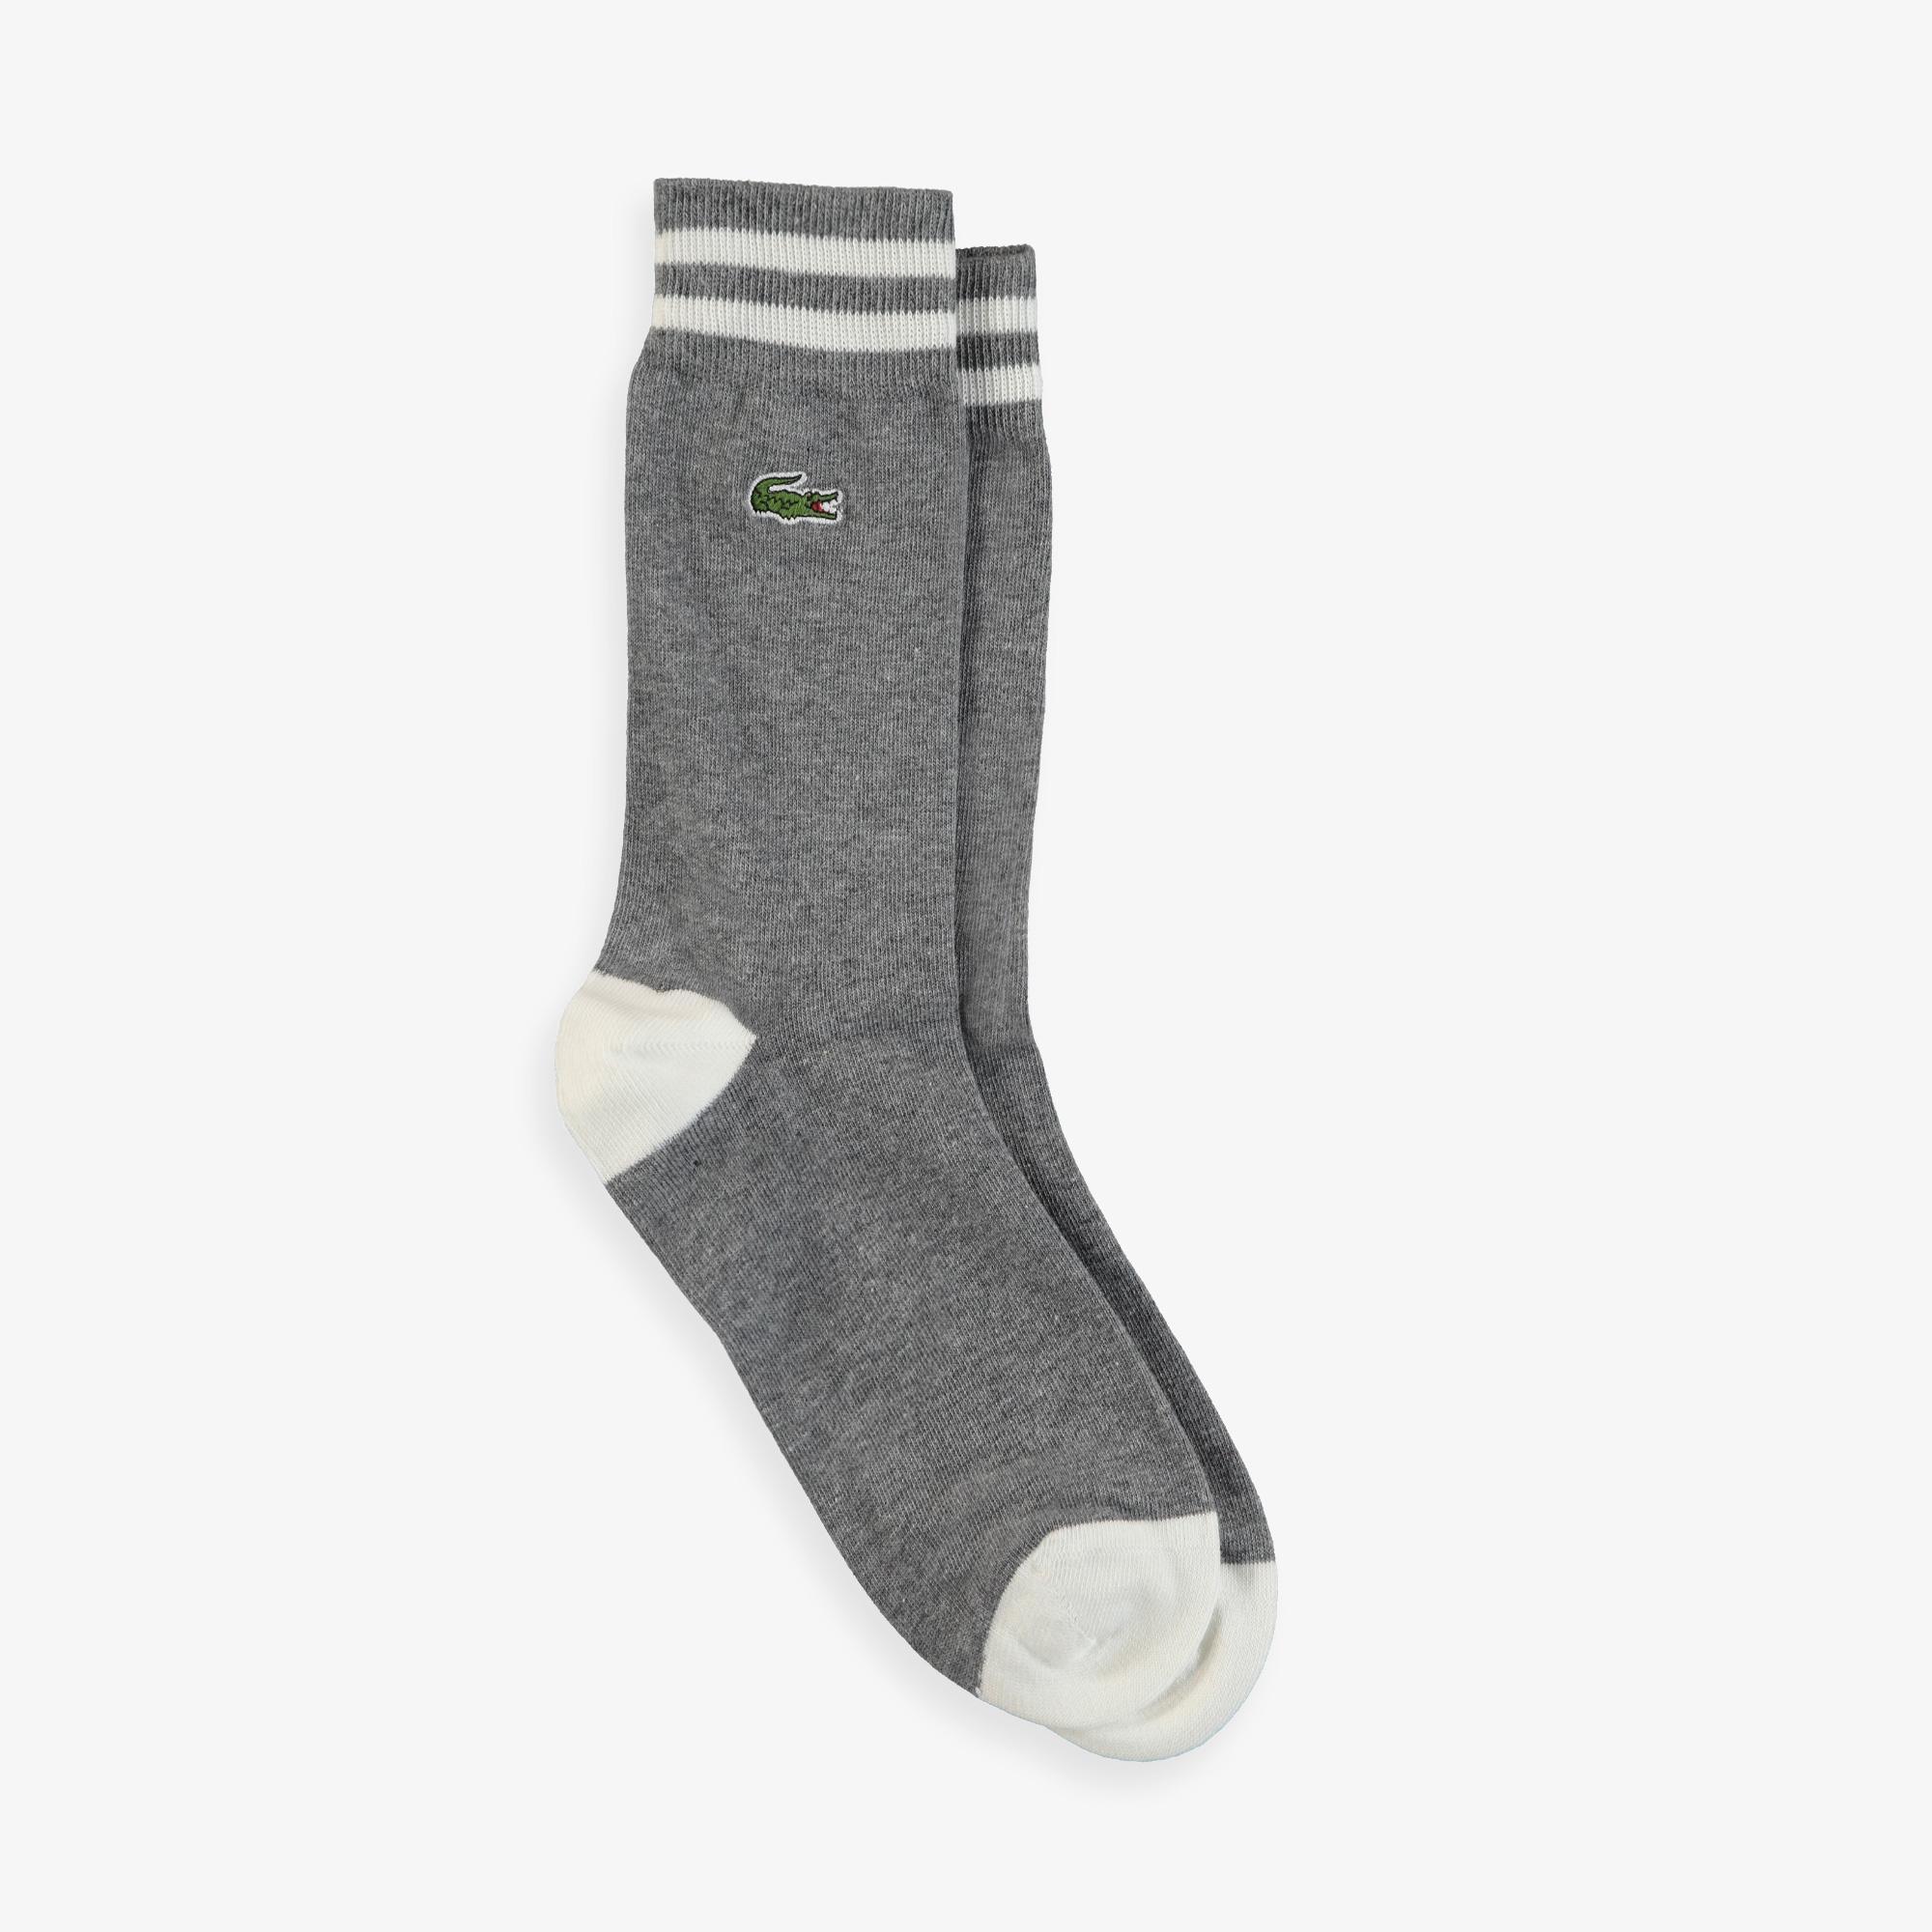 Lacoste Unisex Gri Çorap